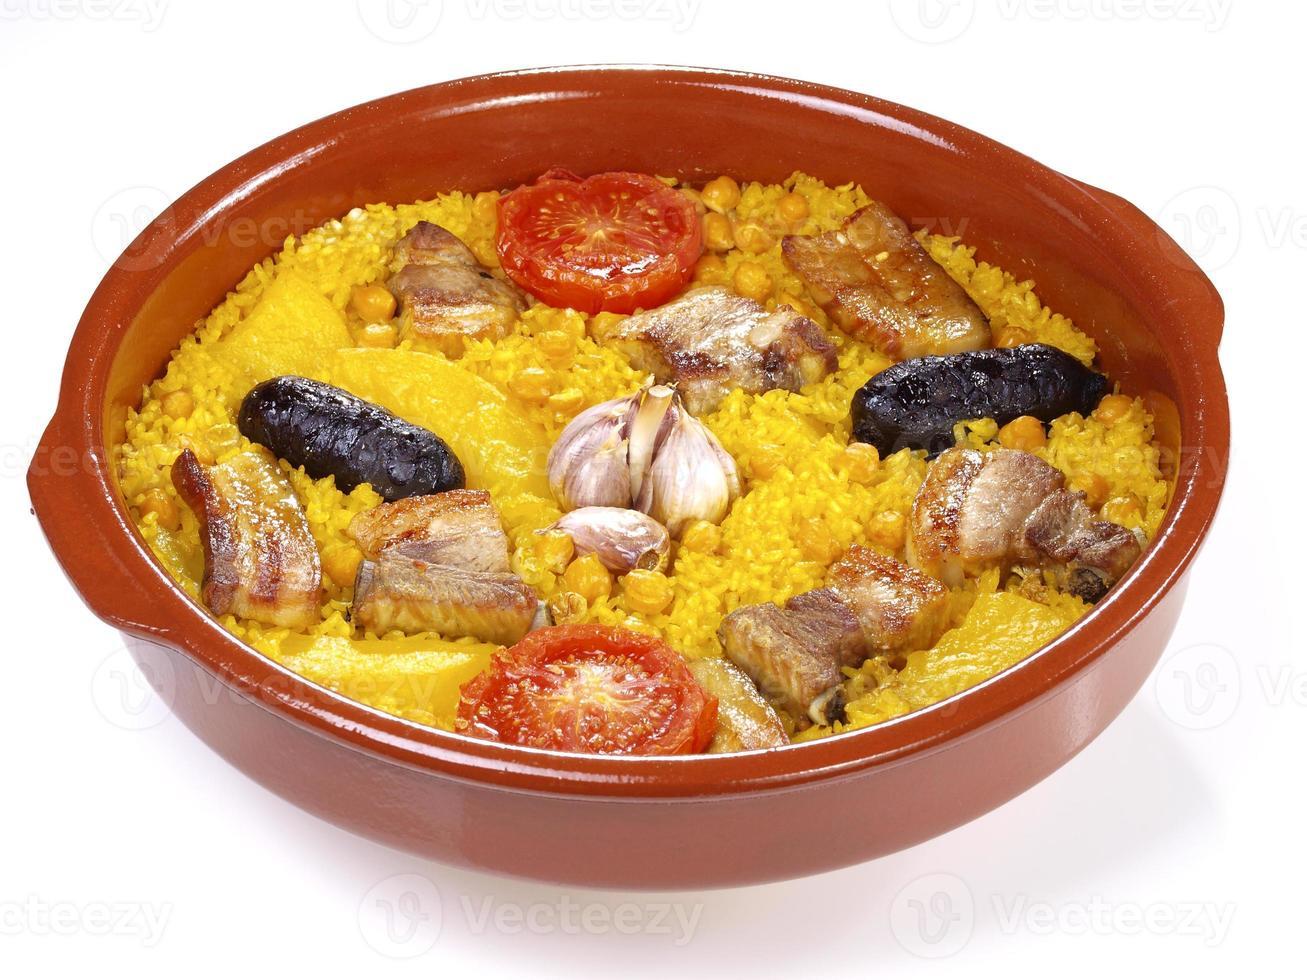 arroz al horno - ofengekochter reis foto